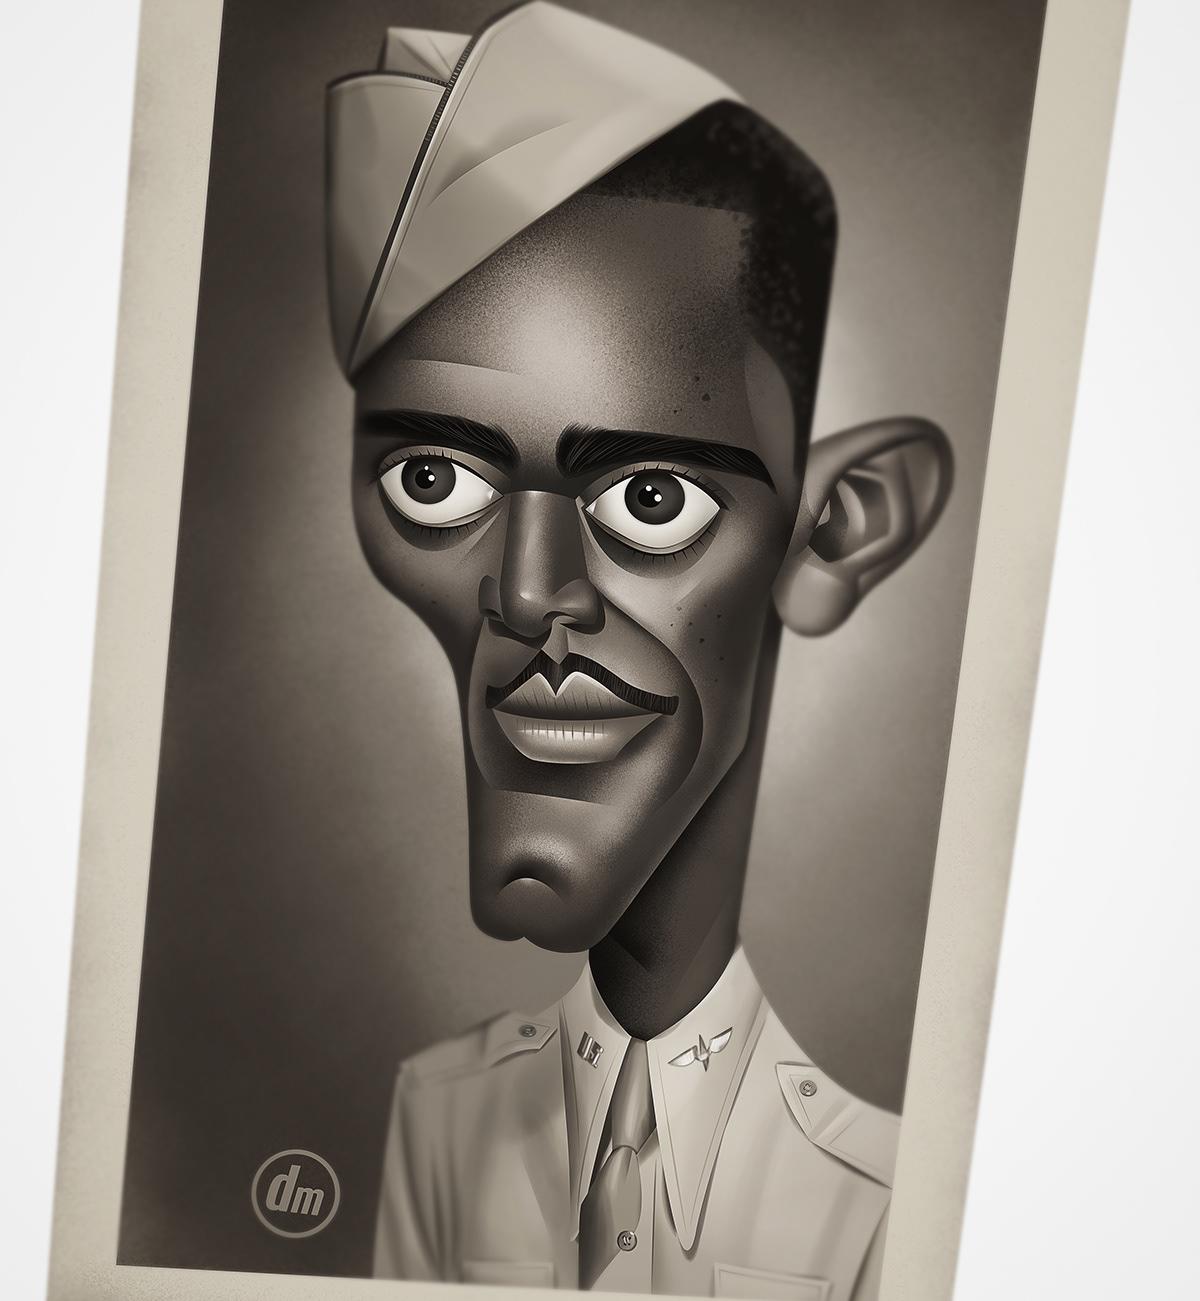 Retro portrait caricature   nostalgic vintage Character design  Sailor 1950s yearbook black and white